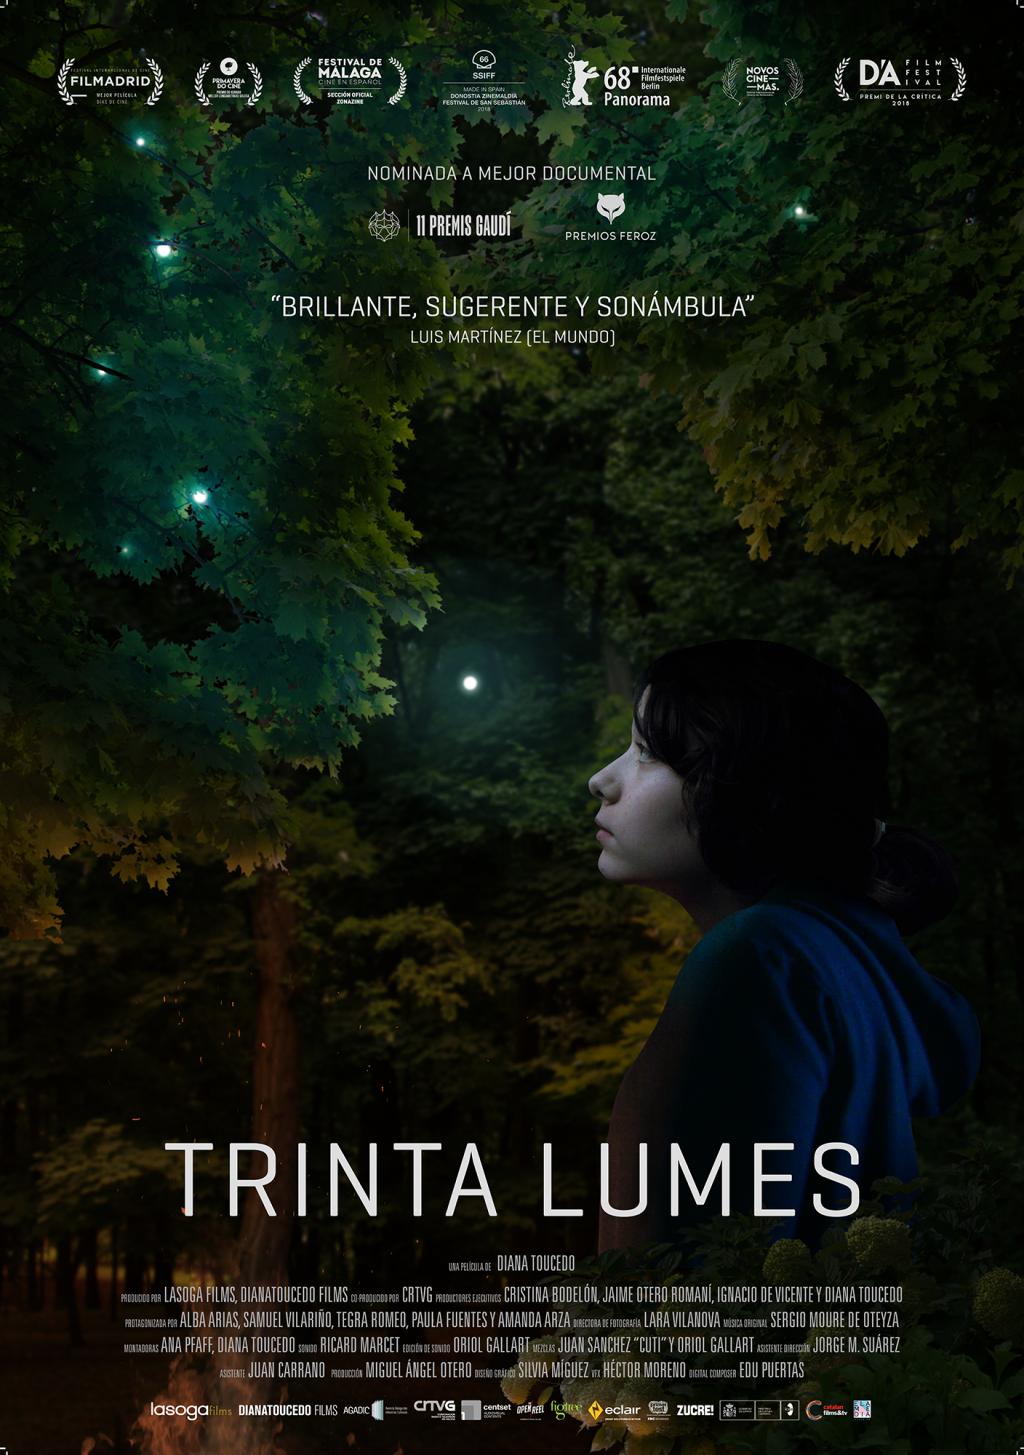 TRINTALUMES_2019Poster_Elamedia